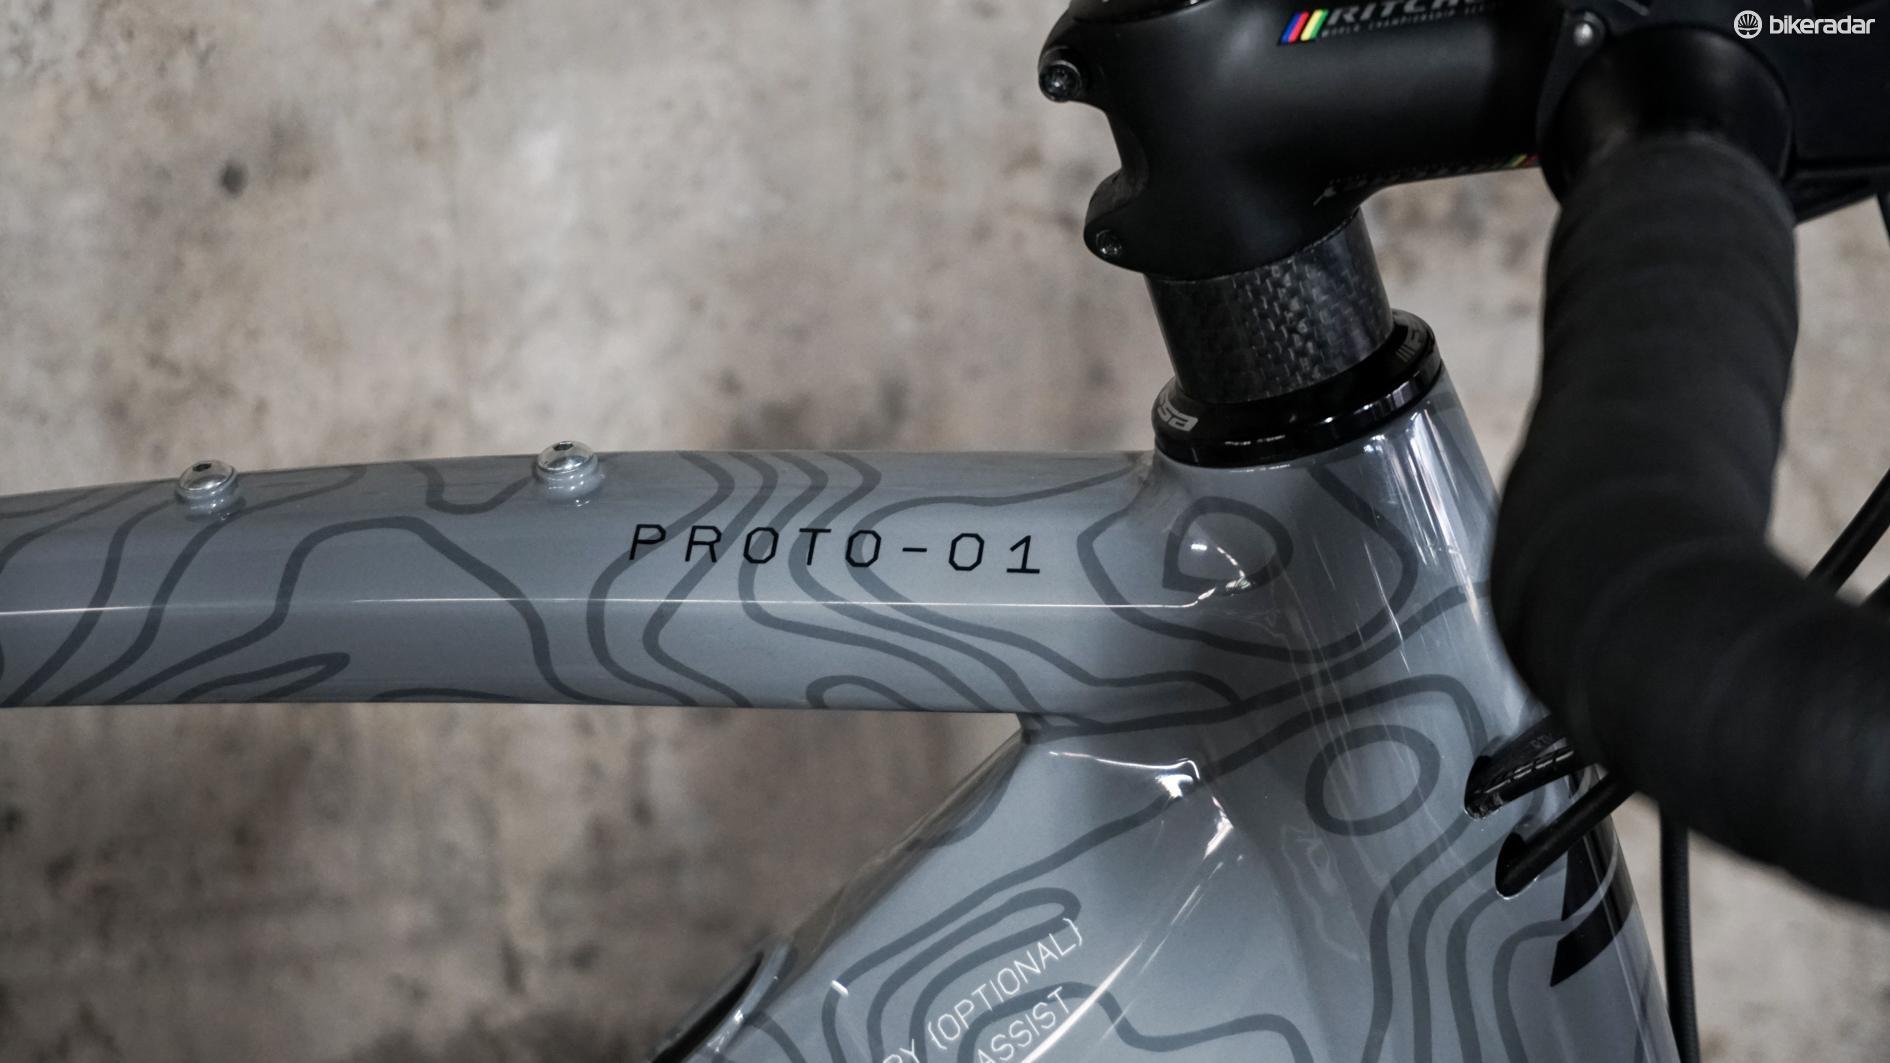 prototype gravel e-bike topography on headtube